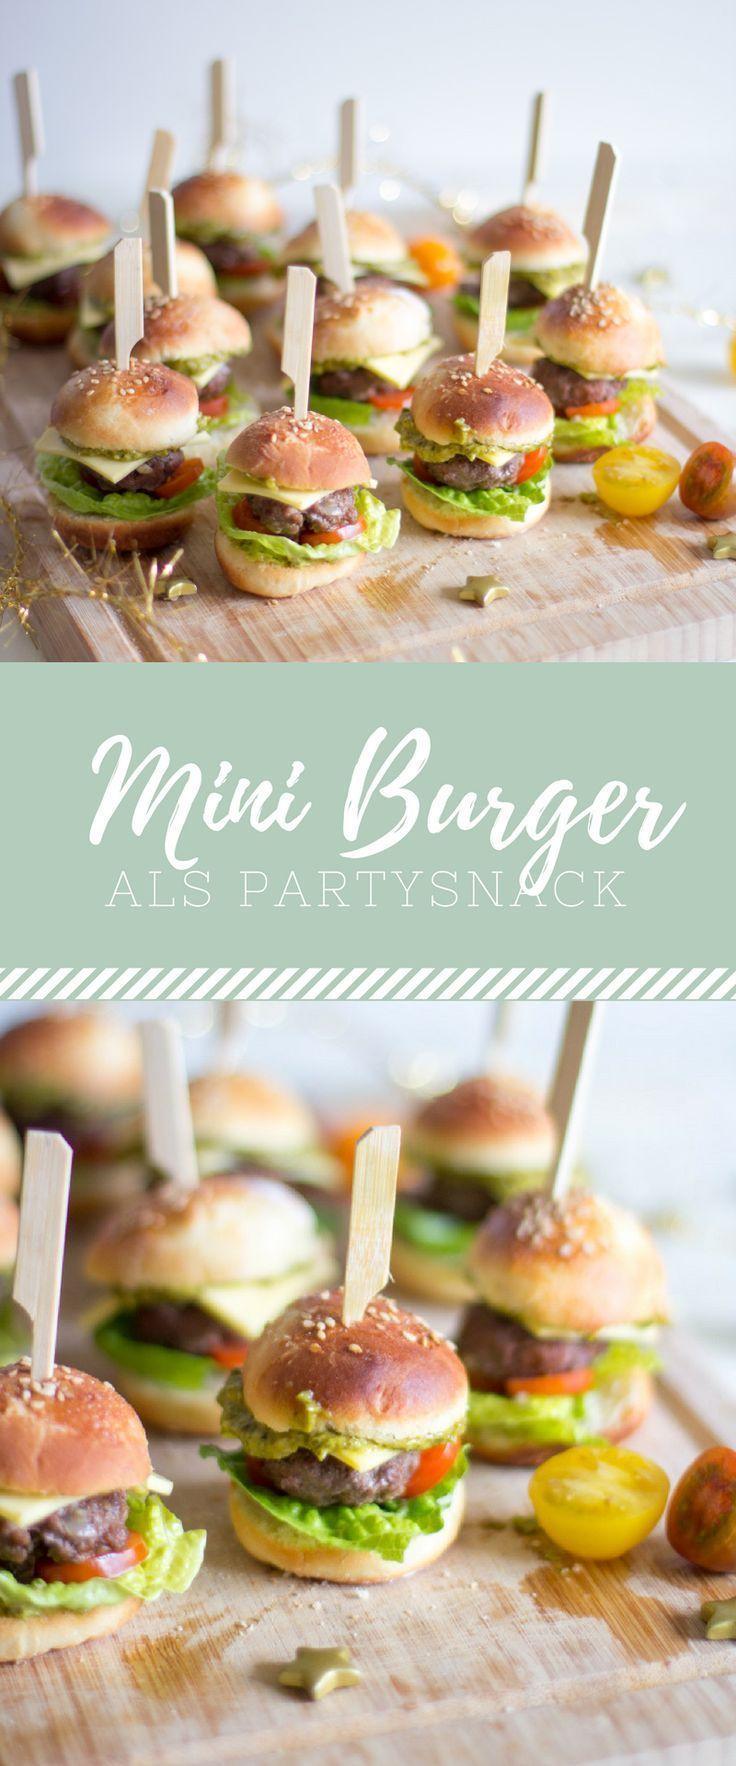 der perfekte party snack mini burger party rezepte fingerfood snacks f r party und. Black Bedroom Furniture Sets. Home Design Ideas